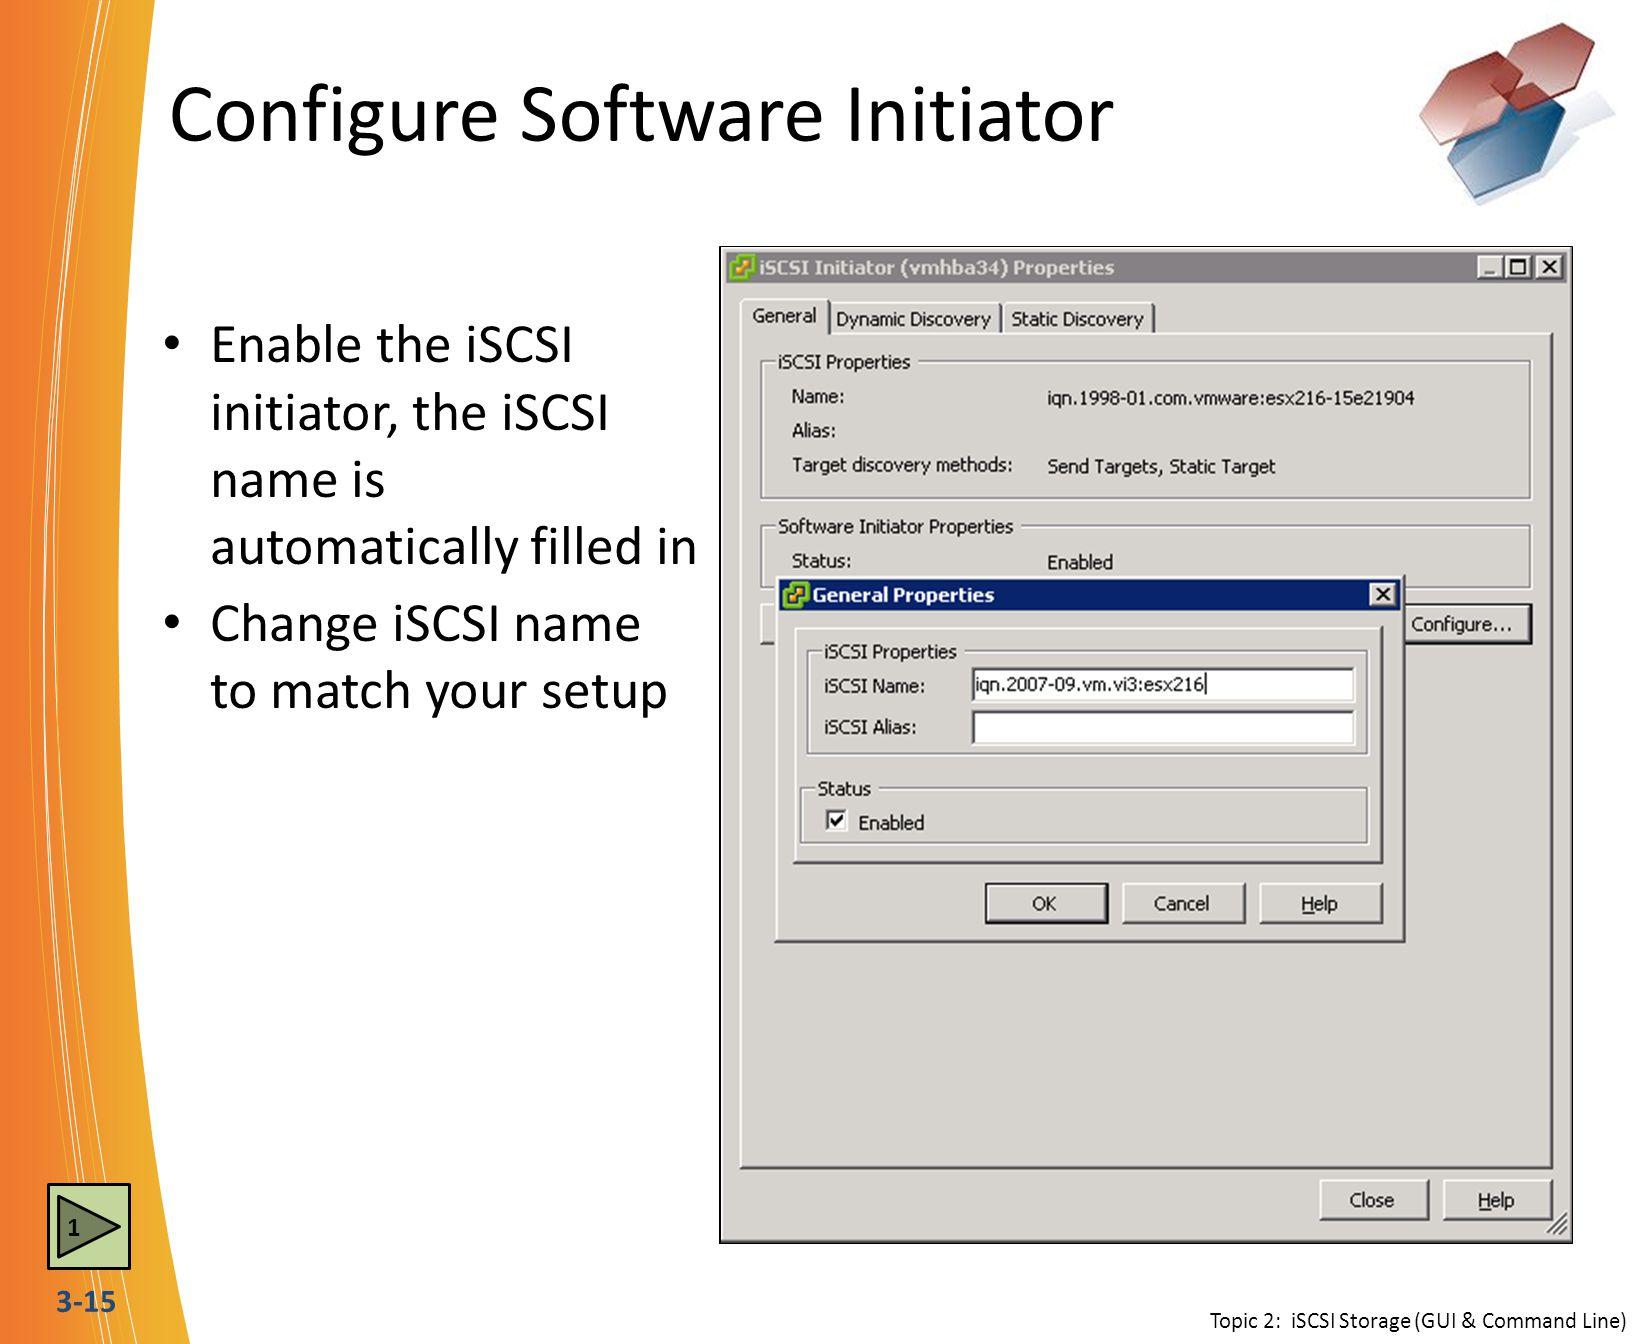 Configure Software Initiator